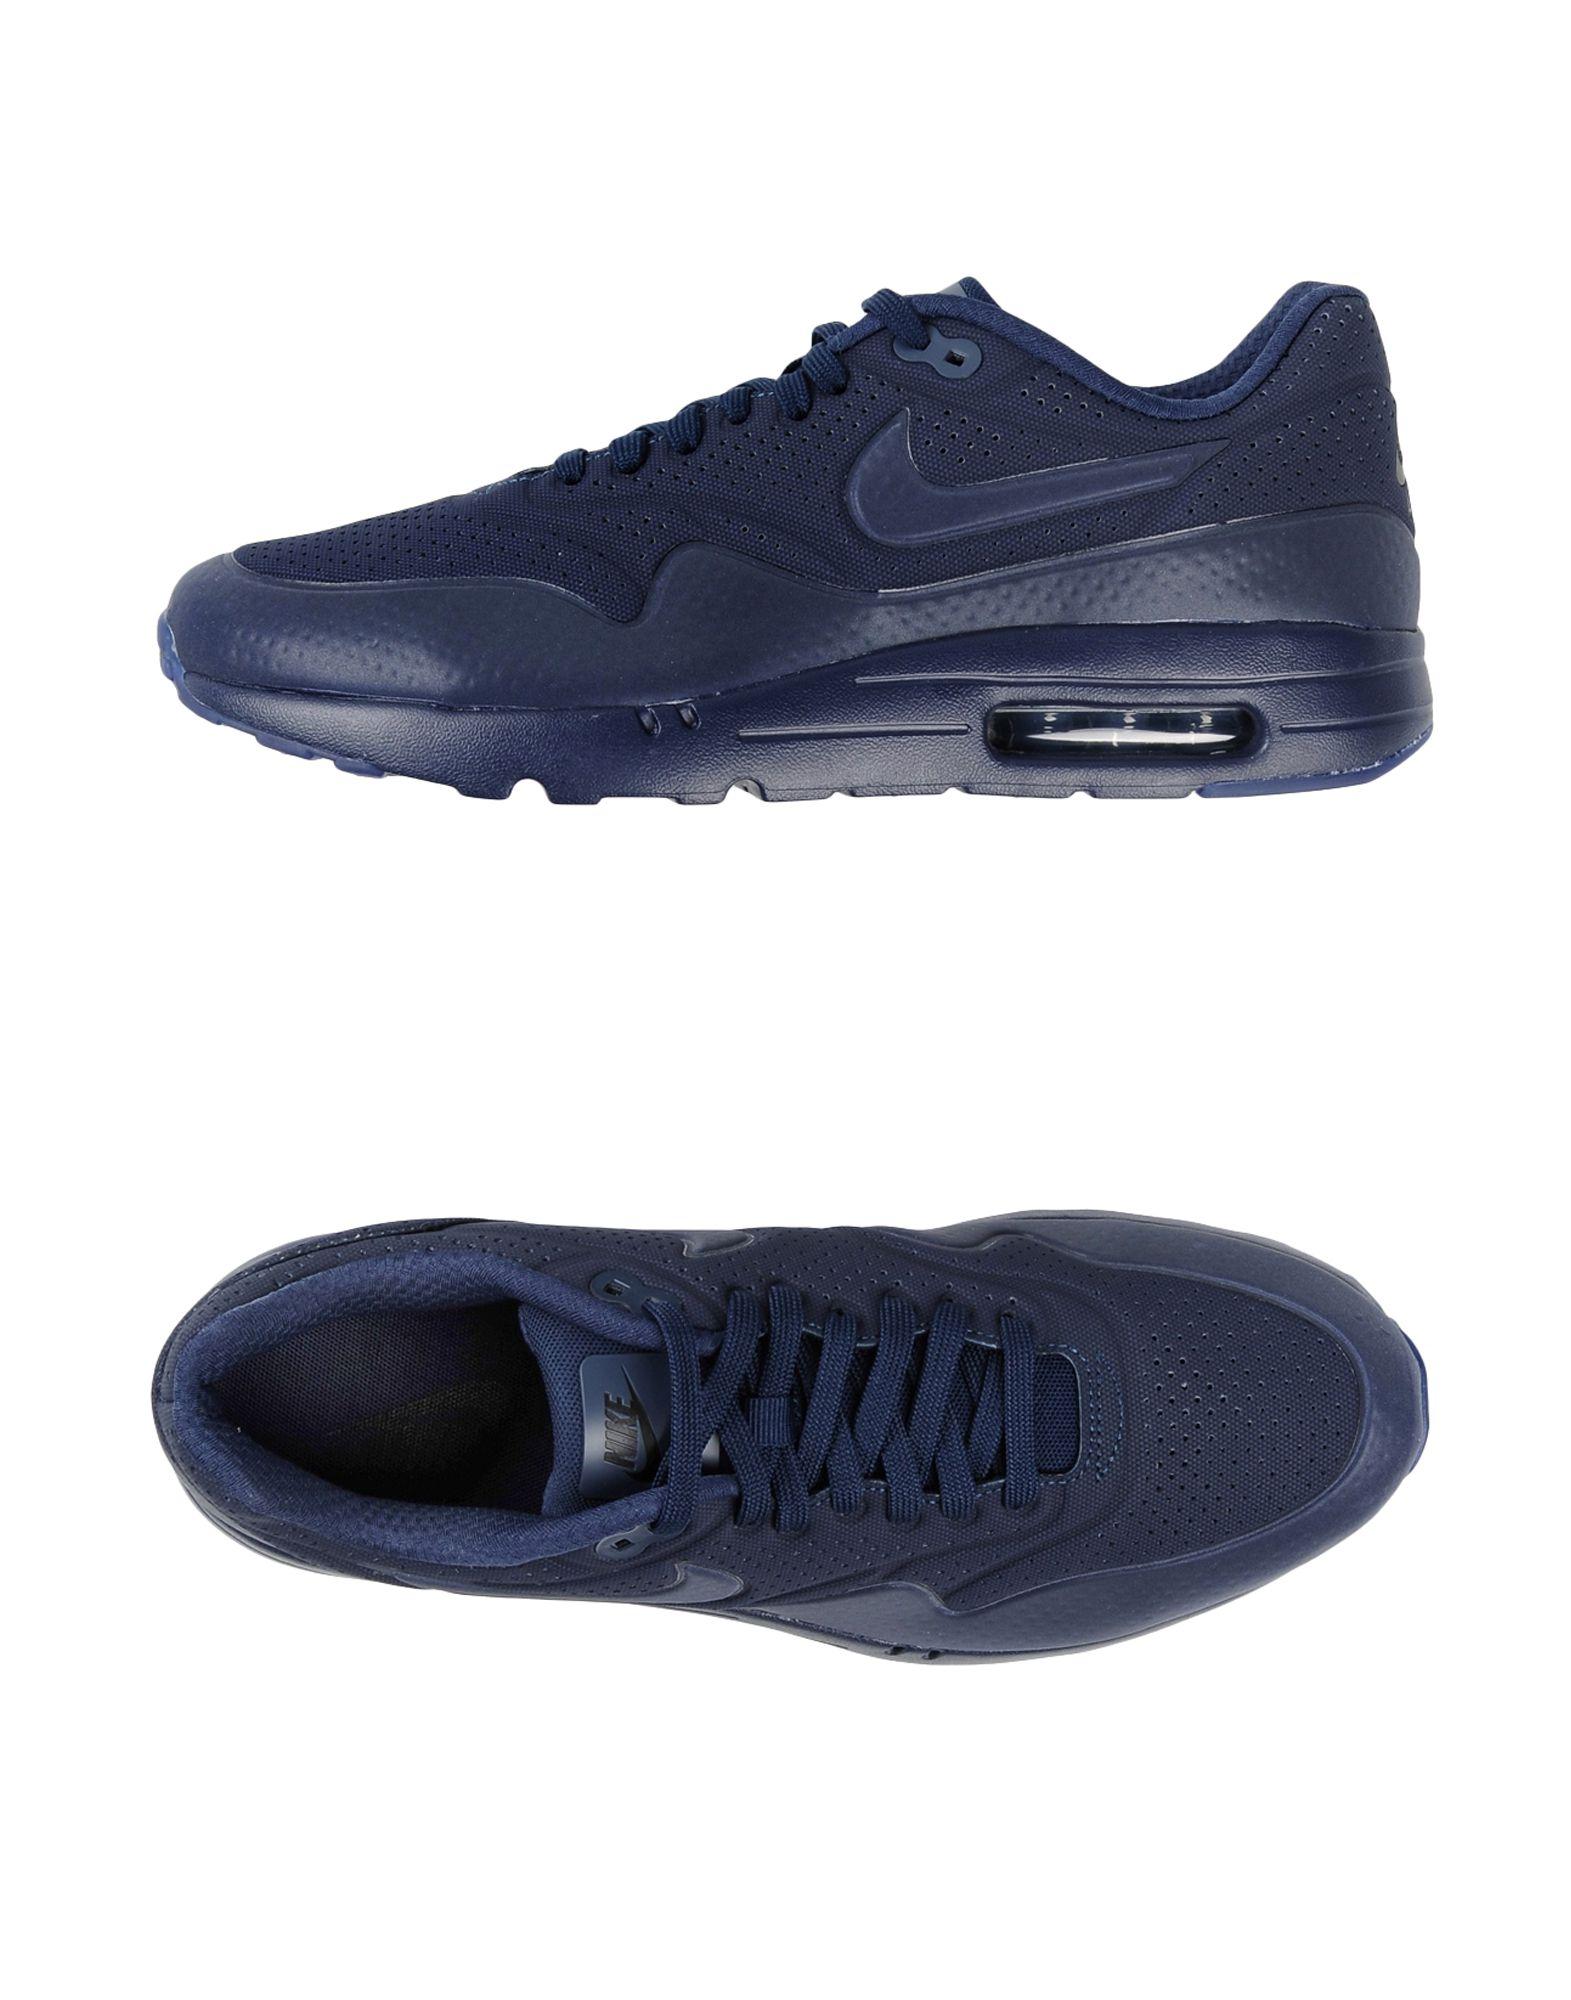 Scarpe da Ginnastica Nike Nike Air Max 1 - Ultra Moire - Uomo - 1 44931512IF 0f0feb